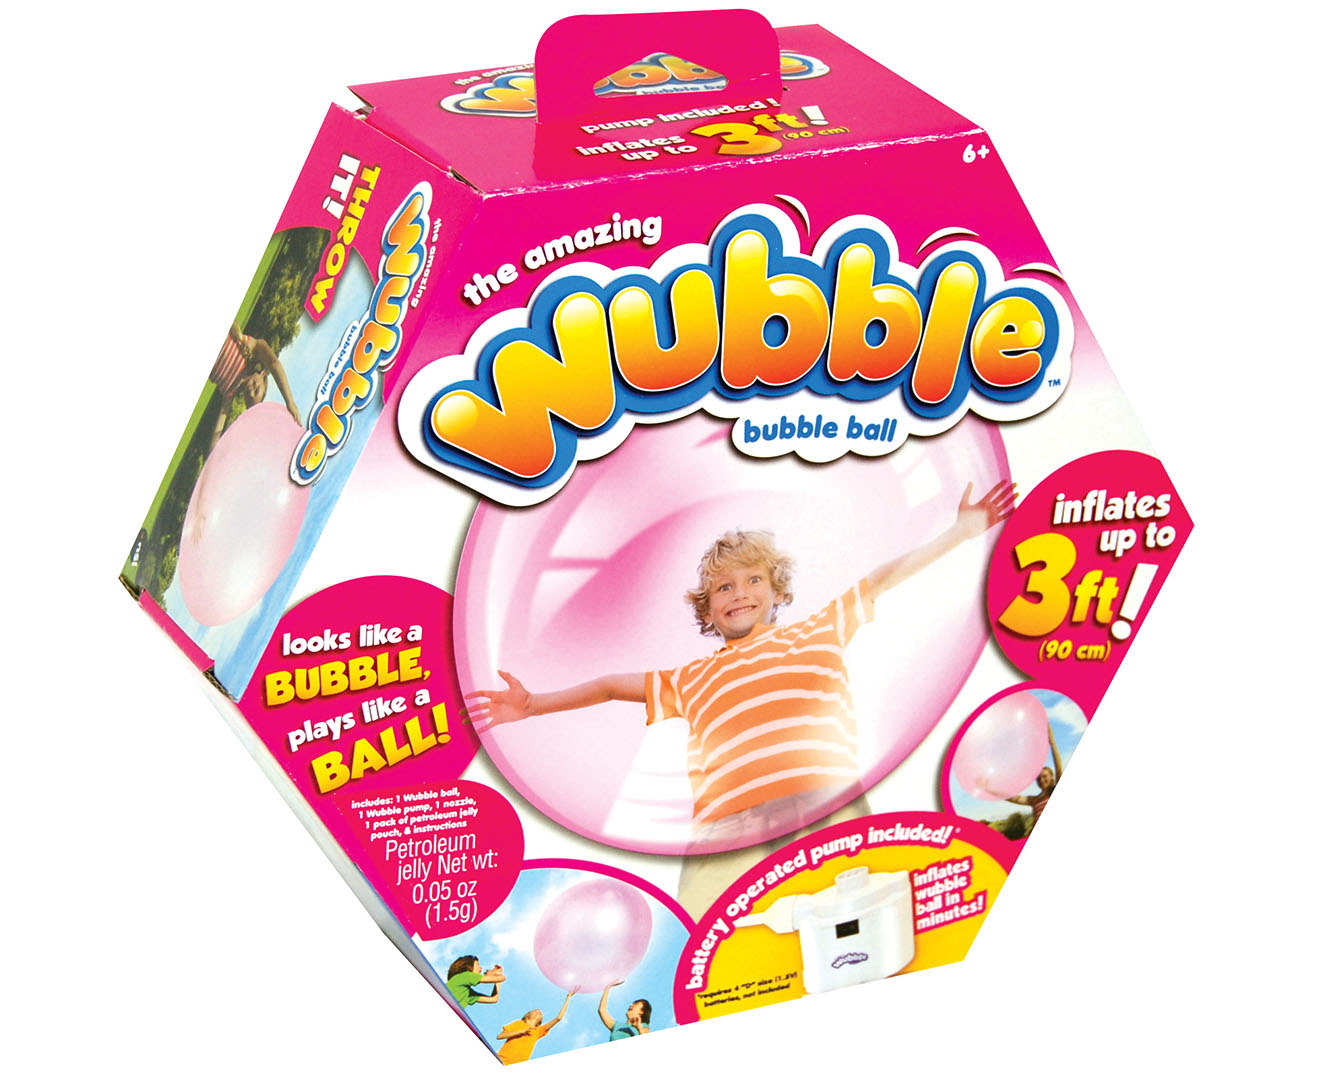 The Amazing Wubble Bubble + Air Pump - Pink Great daily deals at Australia s favourite ...